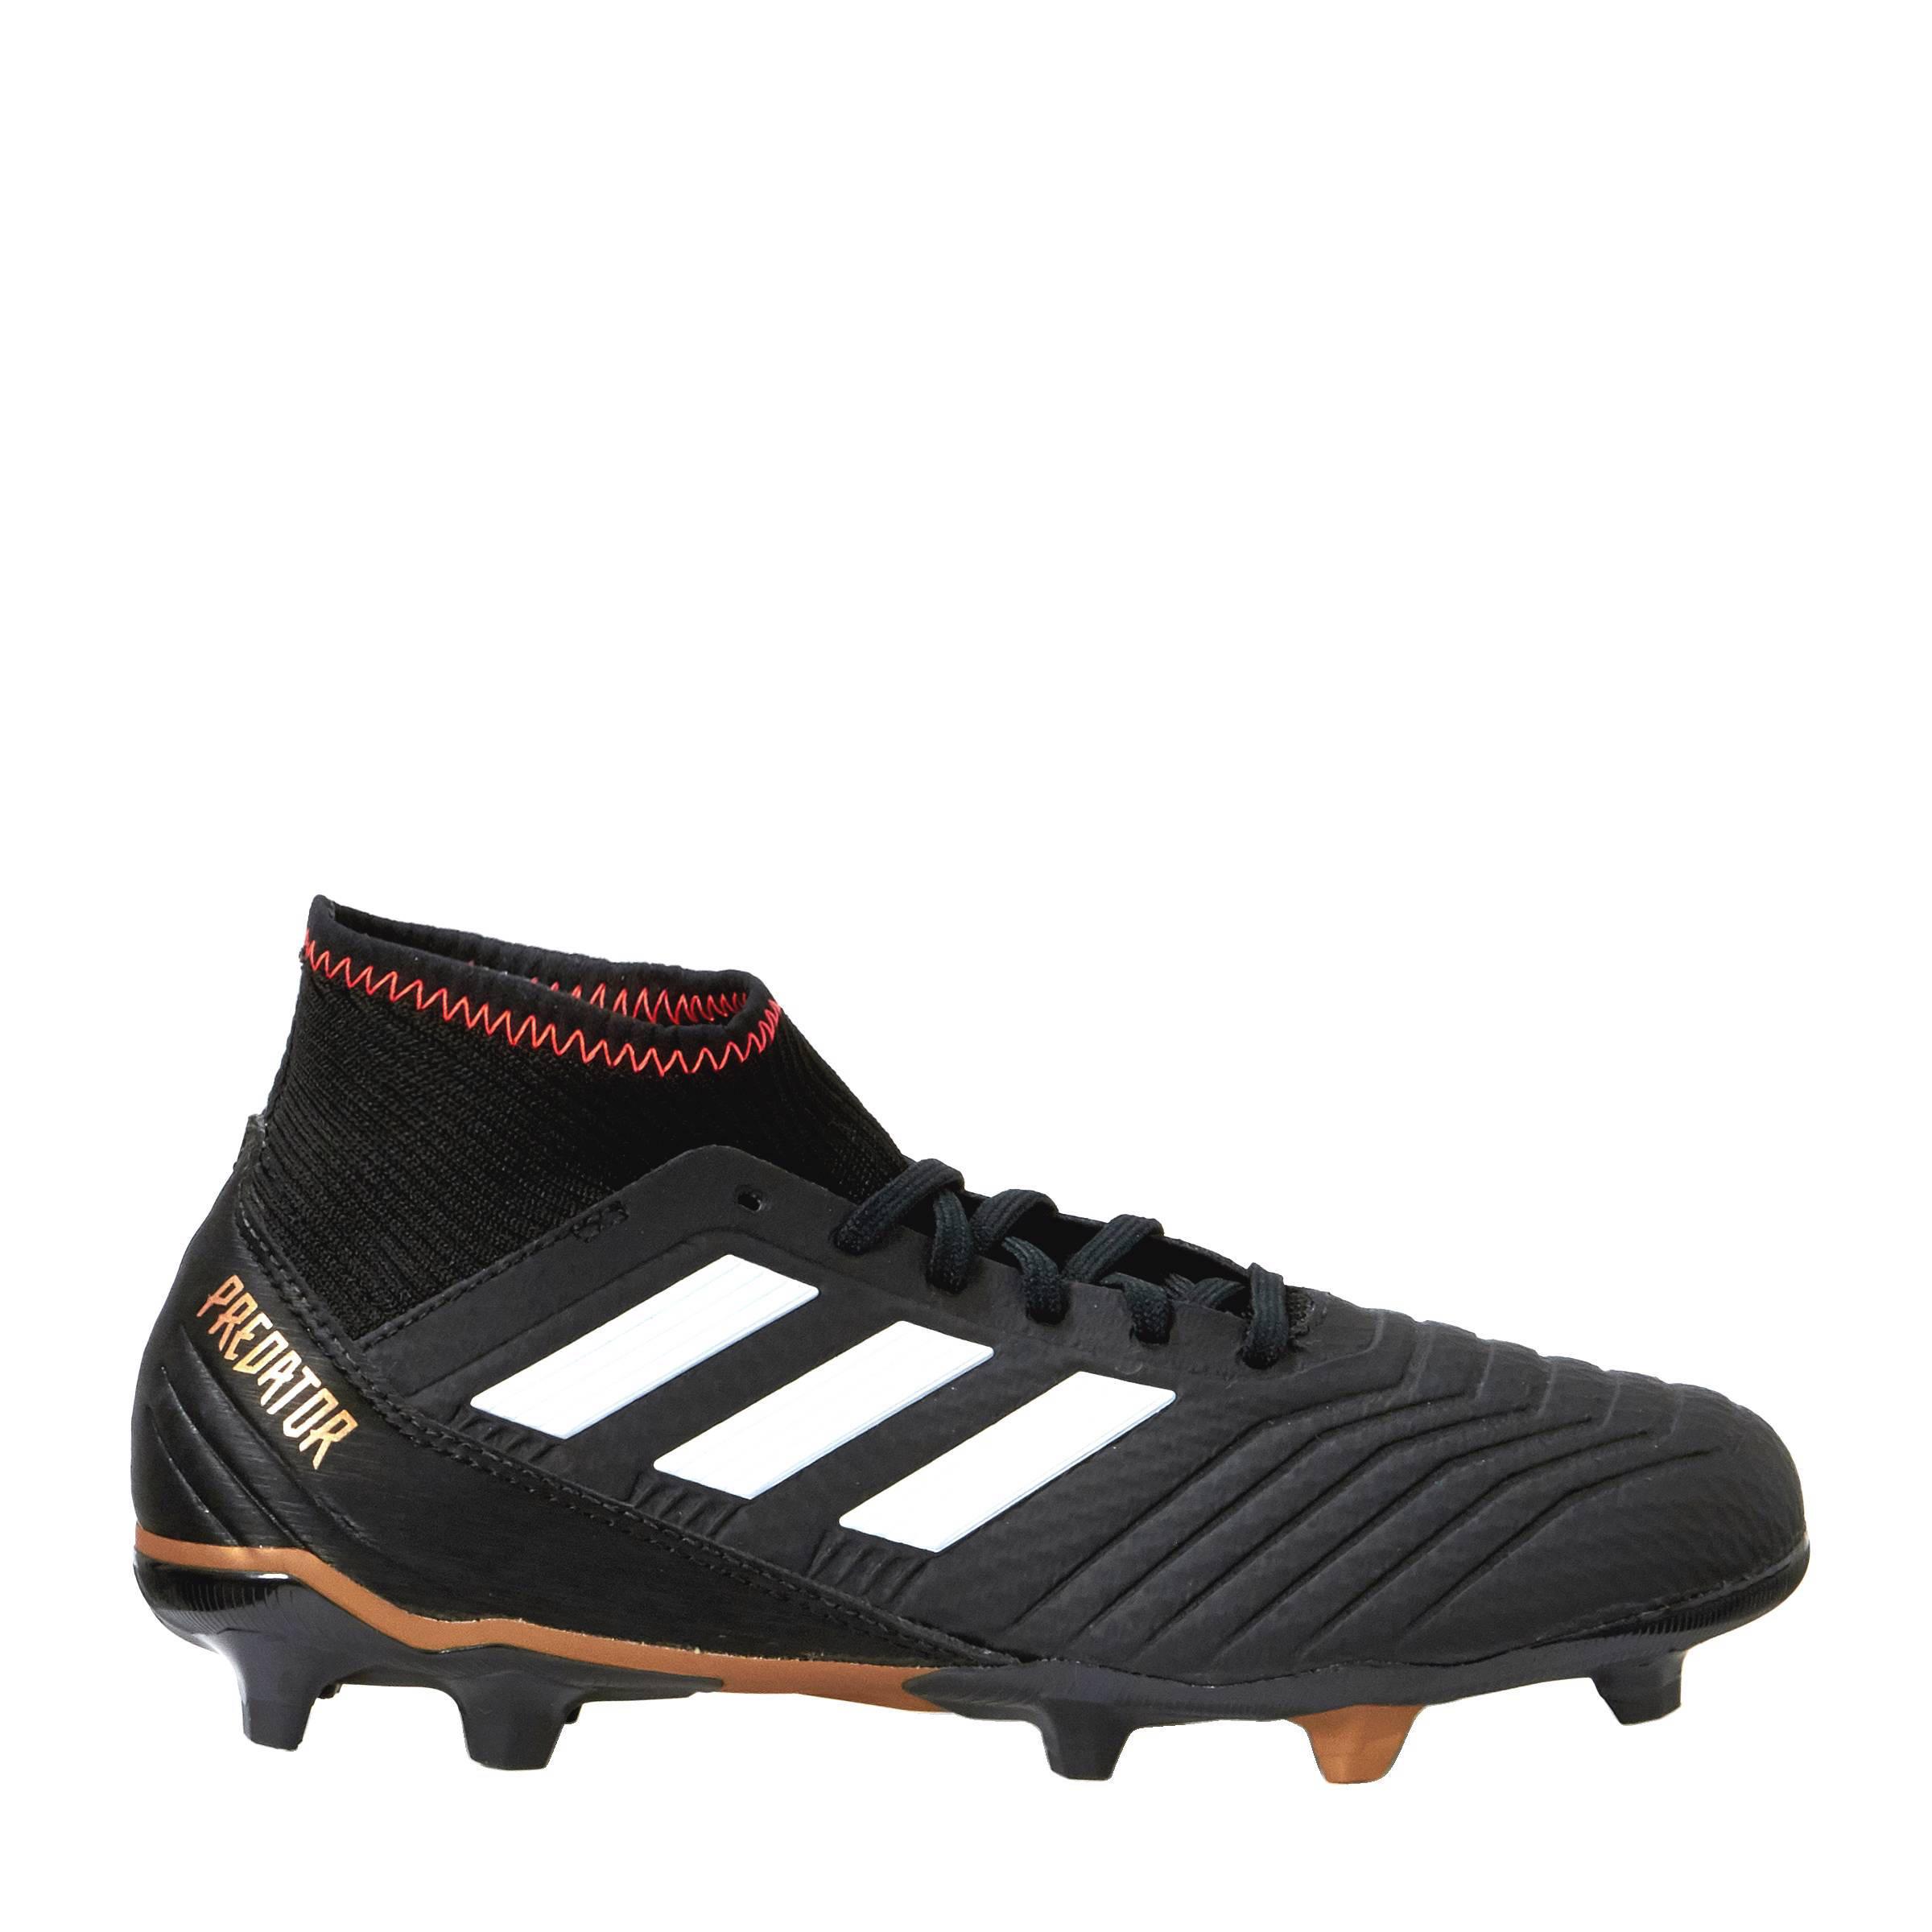 quality design 348d0 17bb3 adidas performance Predator 18.3 F.G. voetbalschoenen  wehka